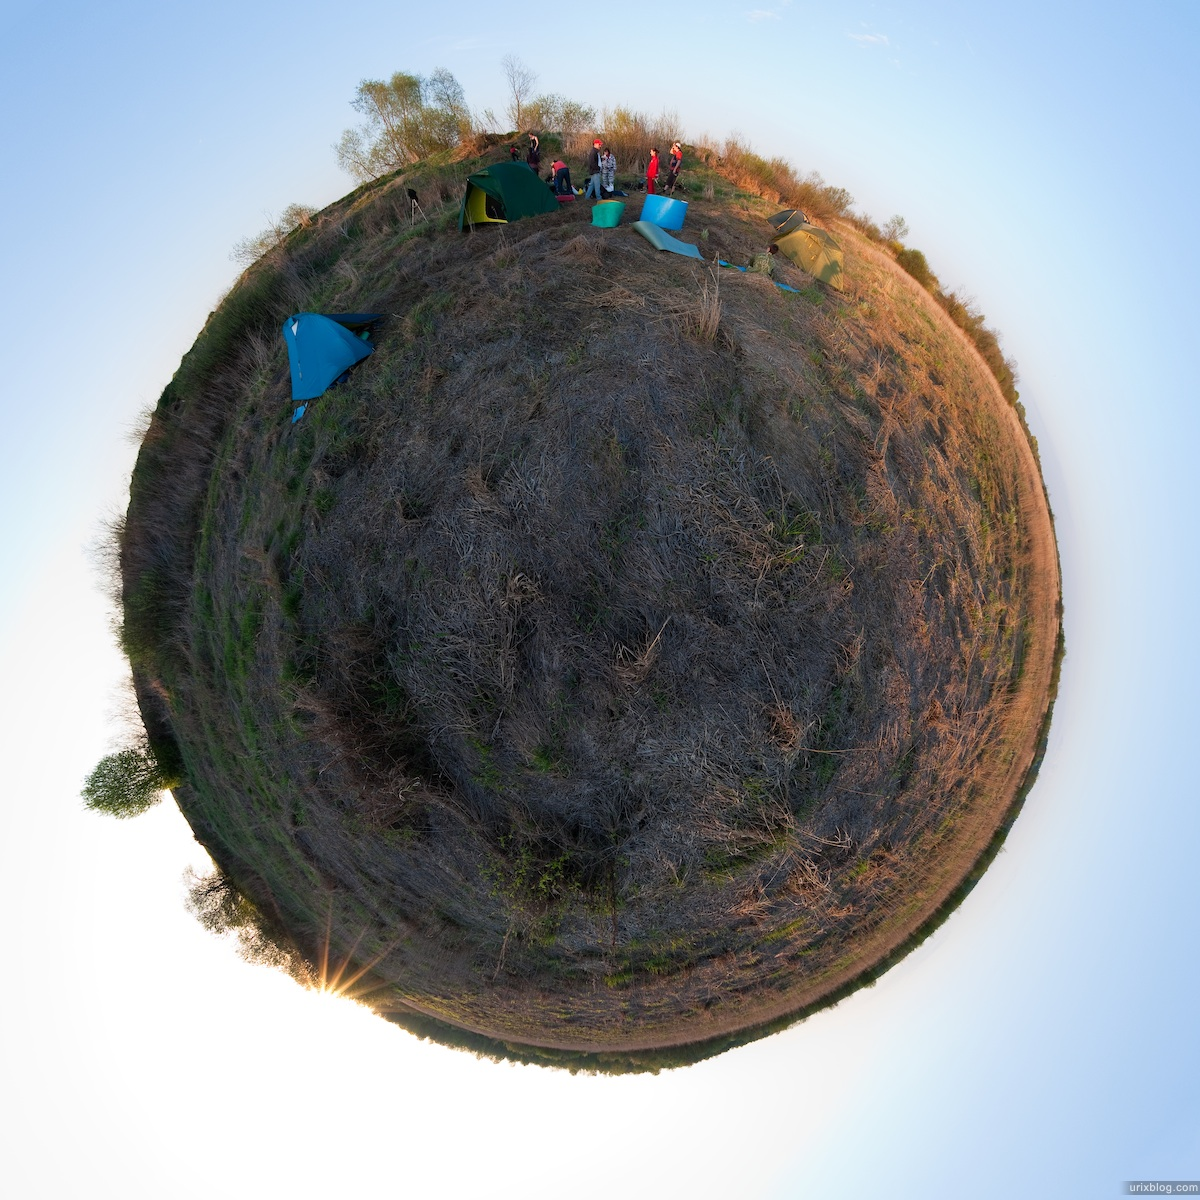 2009 река Дубна сплав Россия путешествие катамаран лодка маленькая планета панорама